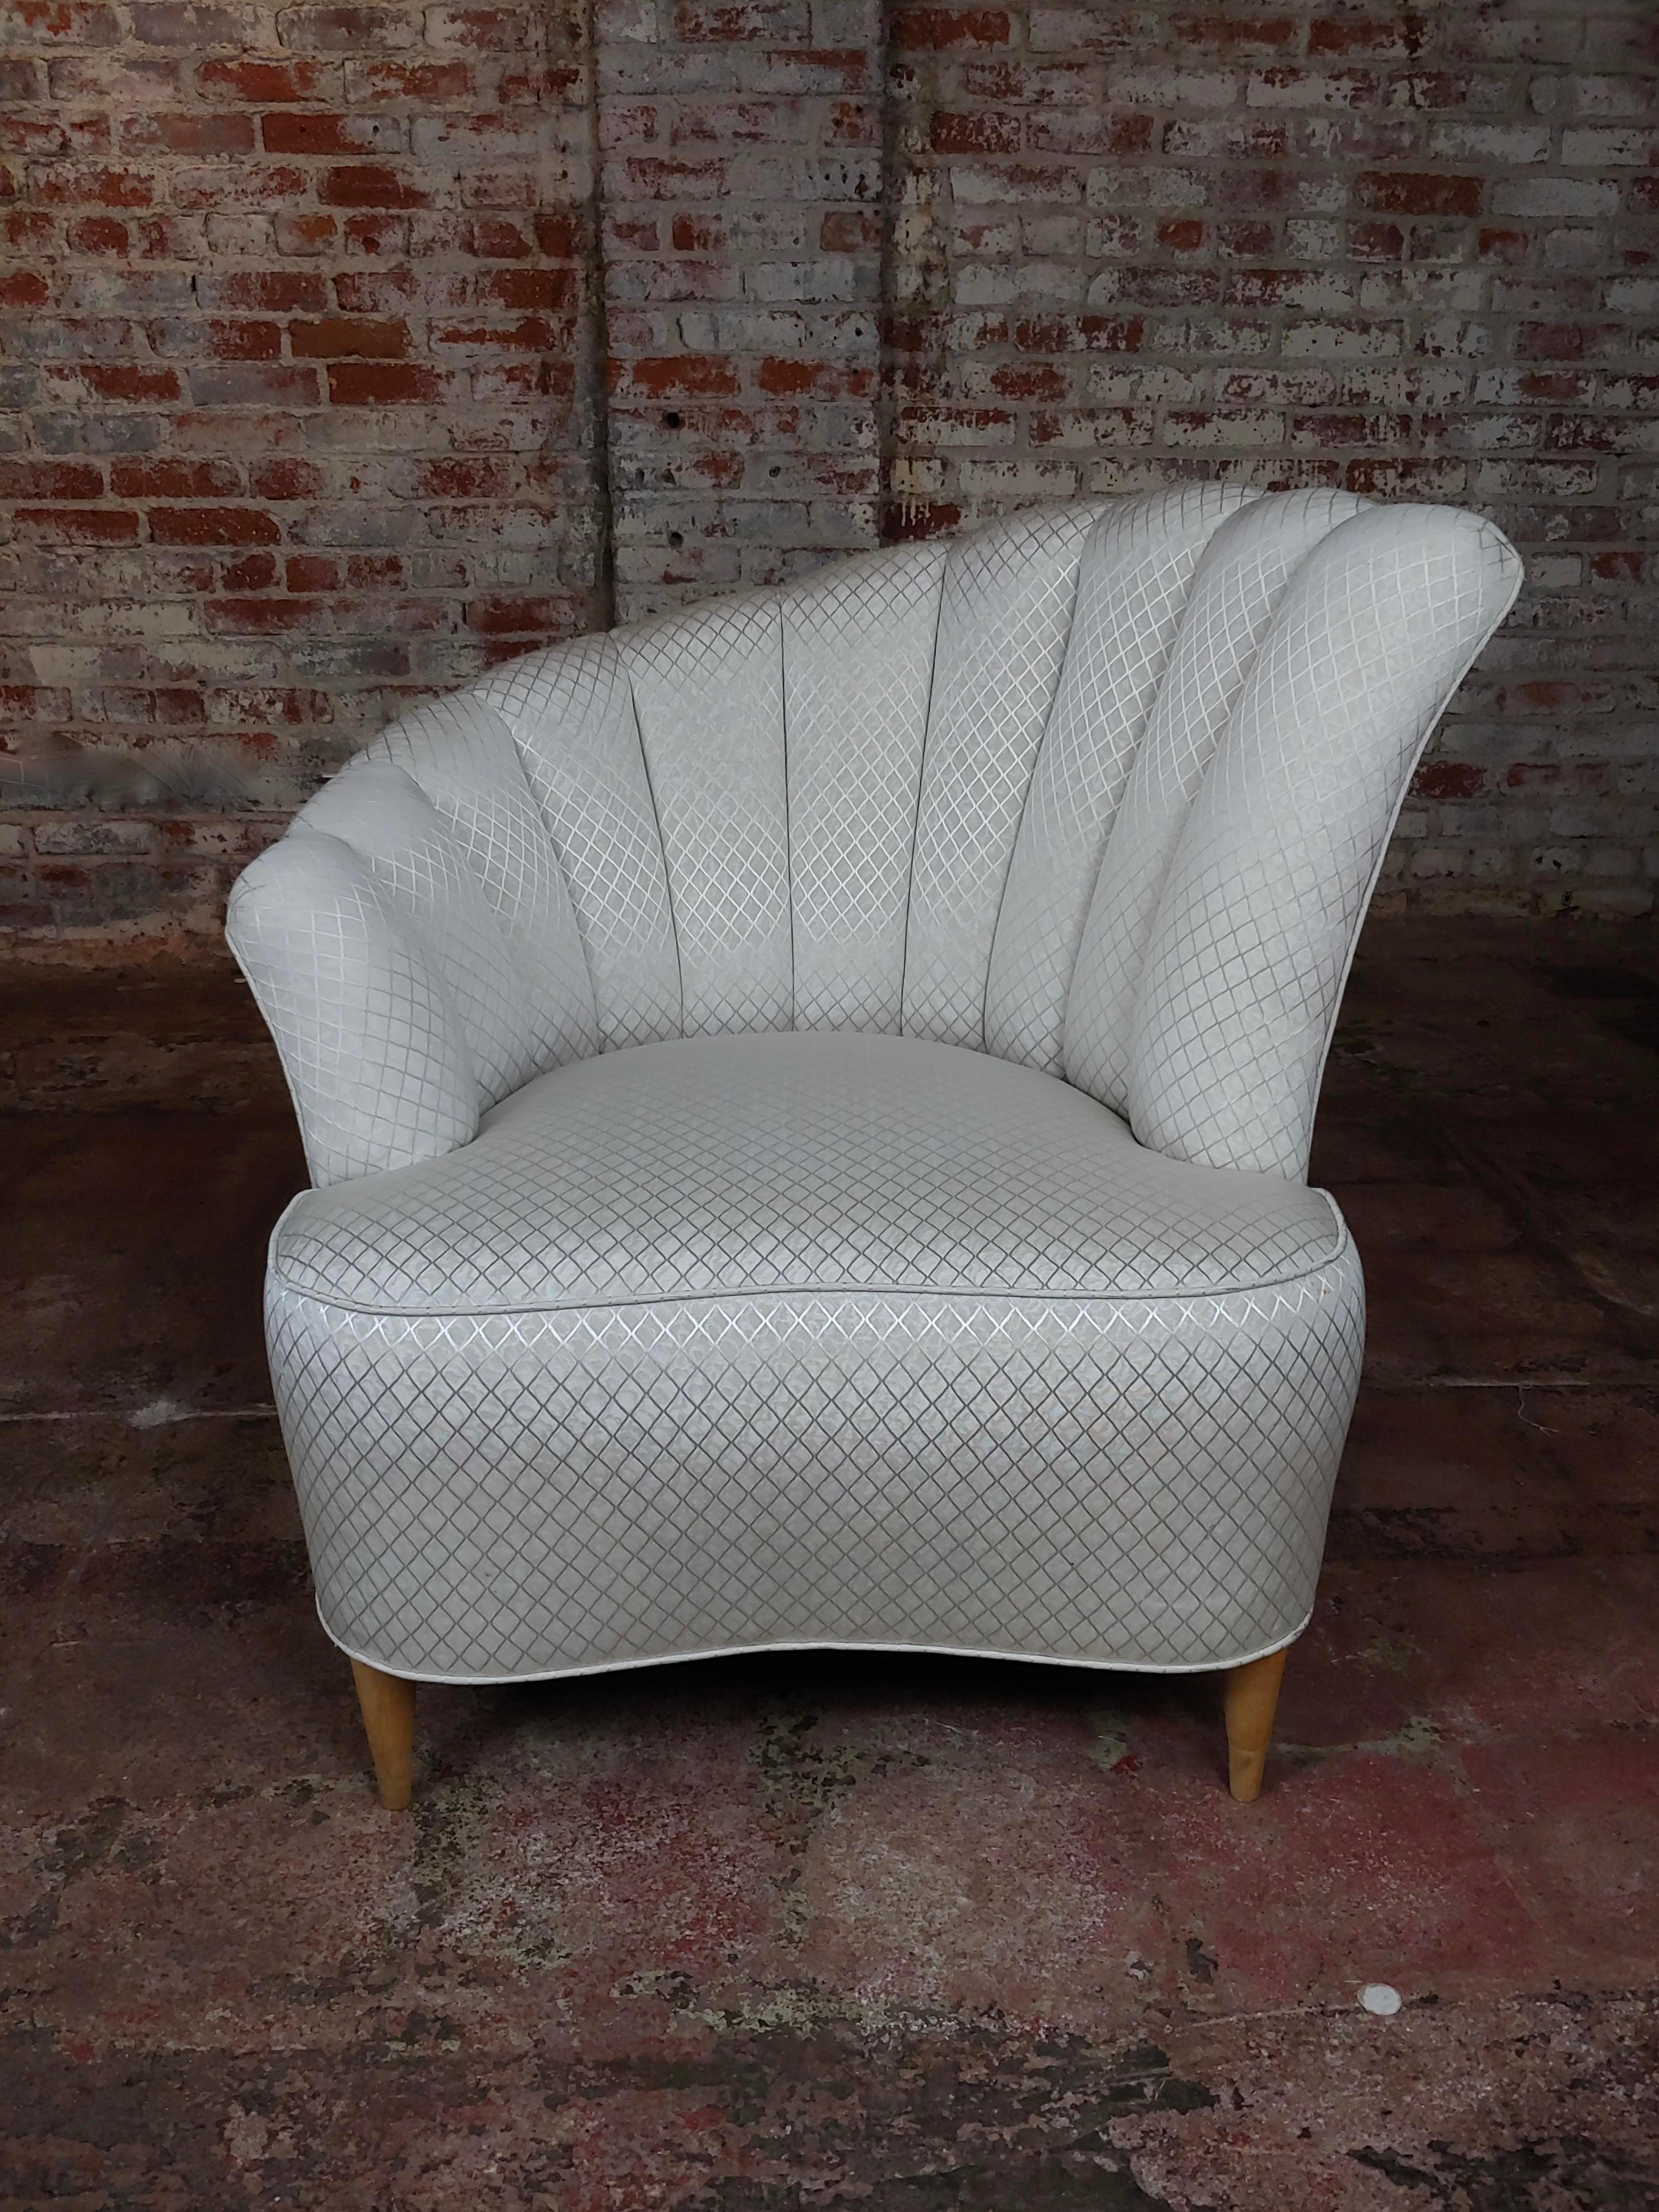 1940s Asymmetrical Chair Fan Back Hollywood Regency 1940s Swivel Tub Club Chair Mid-Century MCM Kagan Nautilus Style